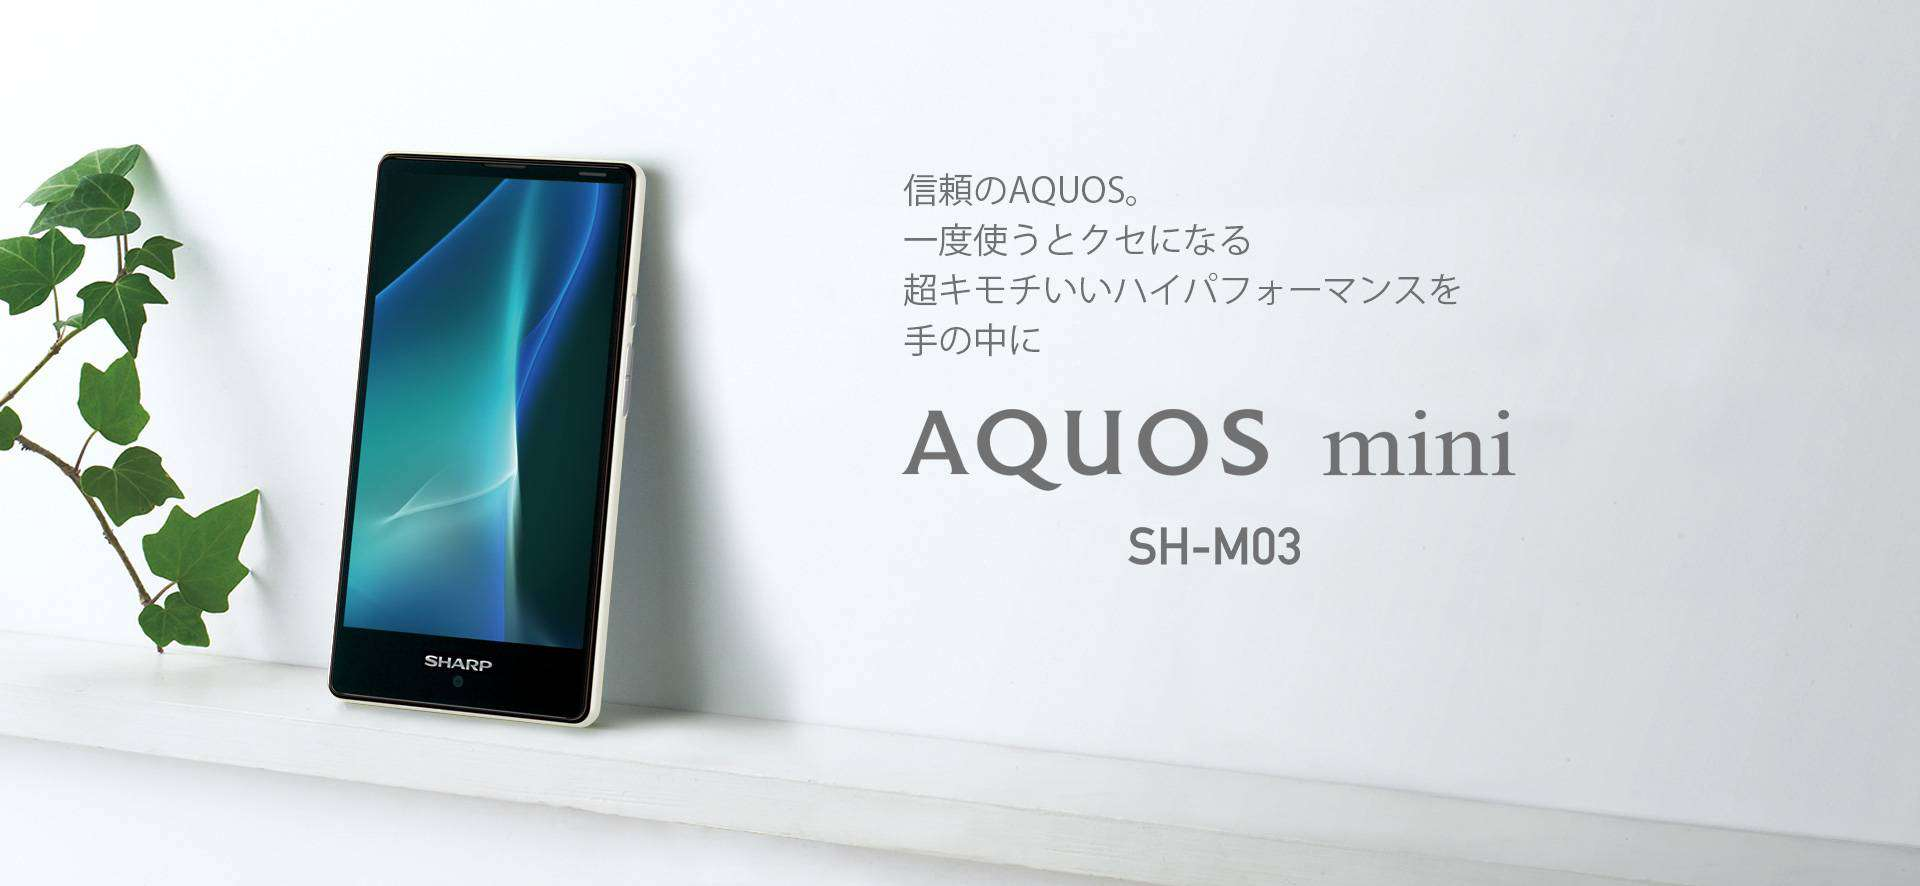 sharp aquos mini sh mo3 1